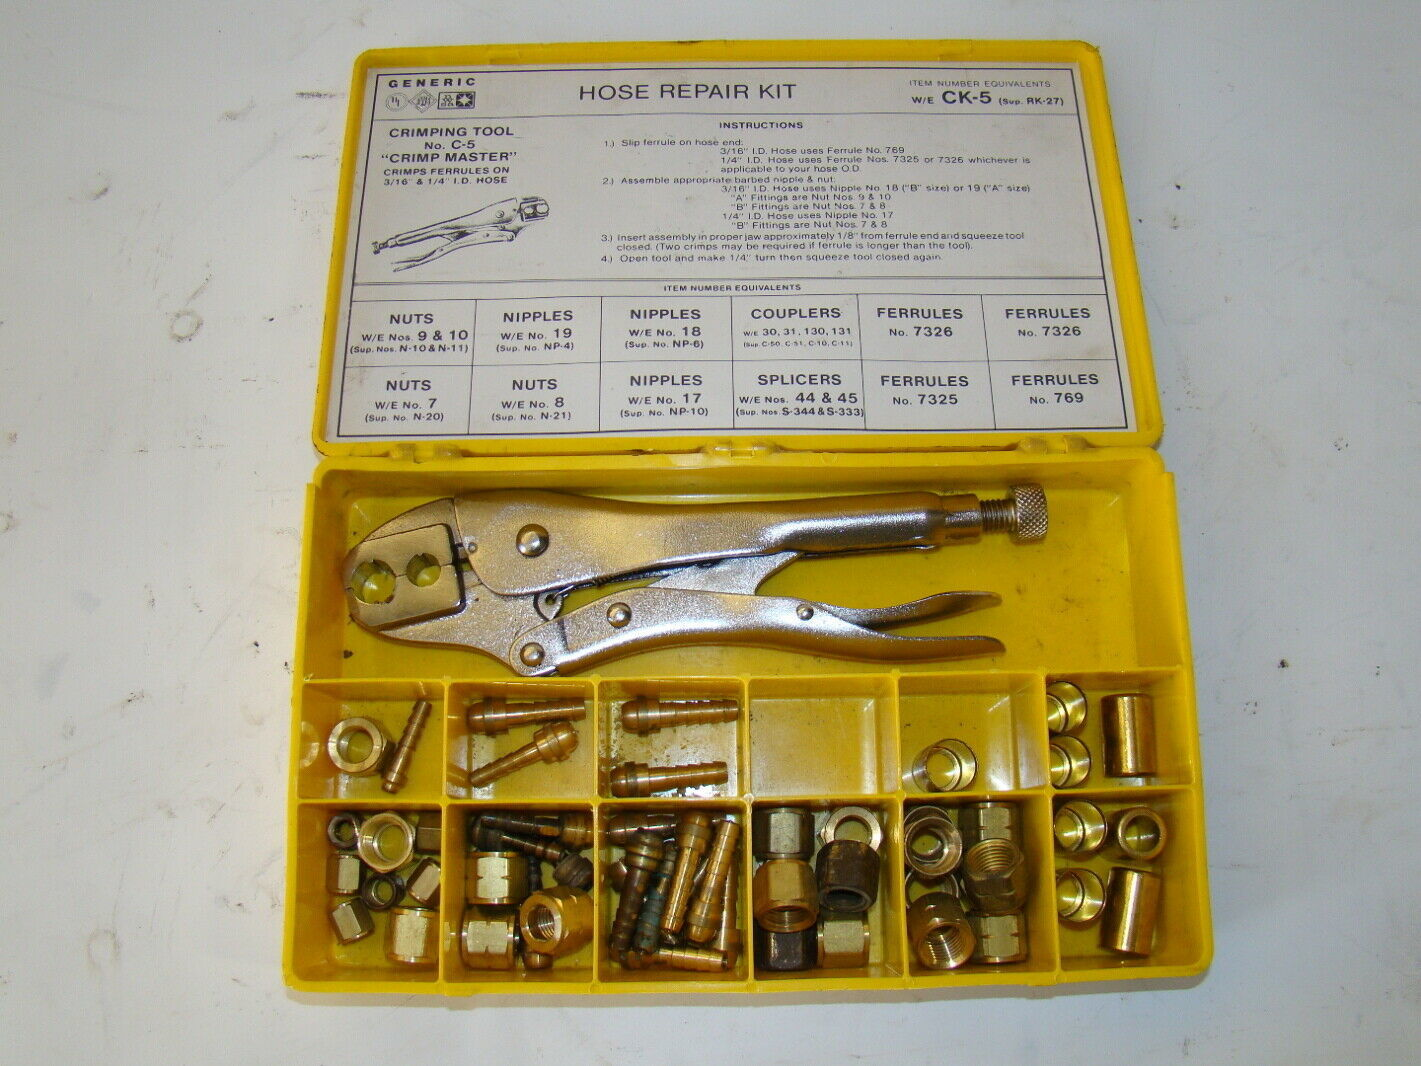 Generic Hose Repair Kit CK-5 | Joseph Fazzio, Incorporated